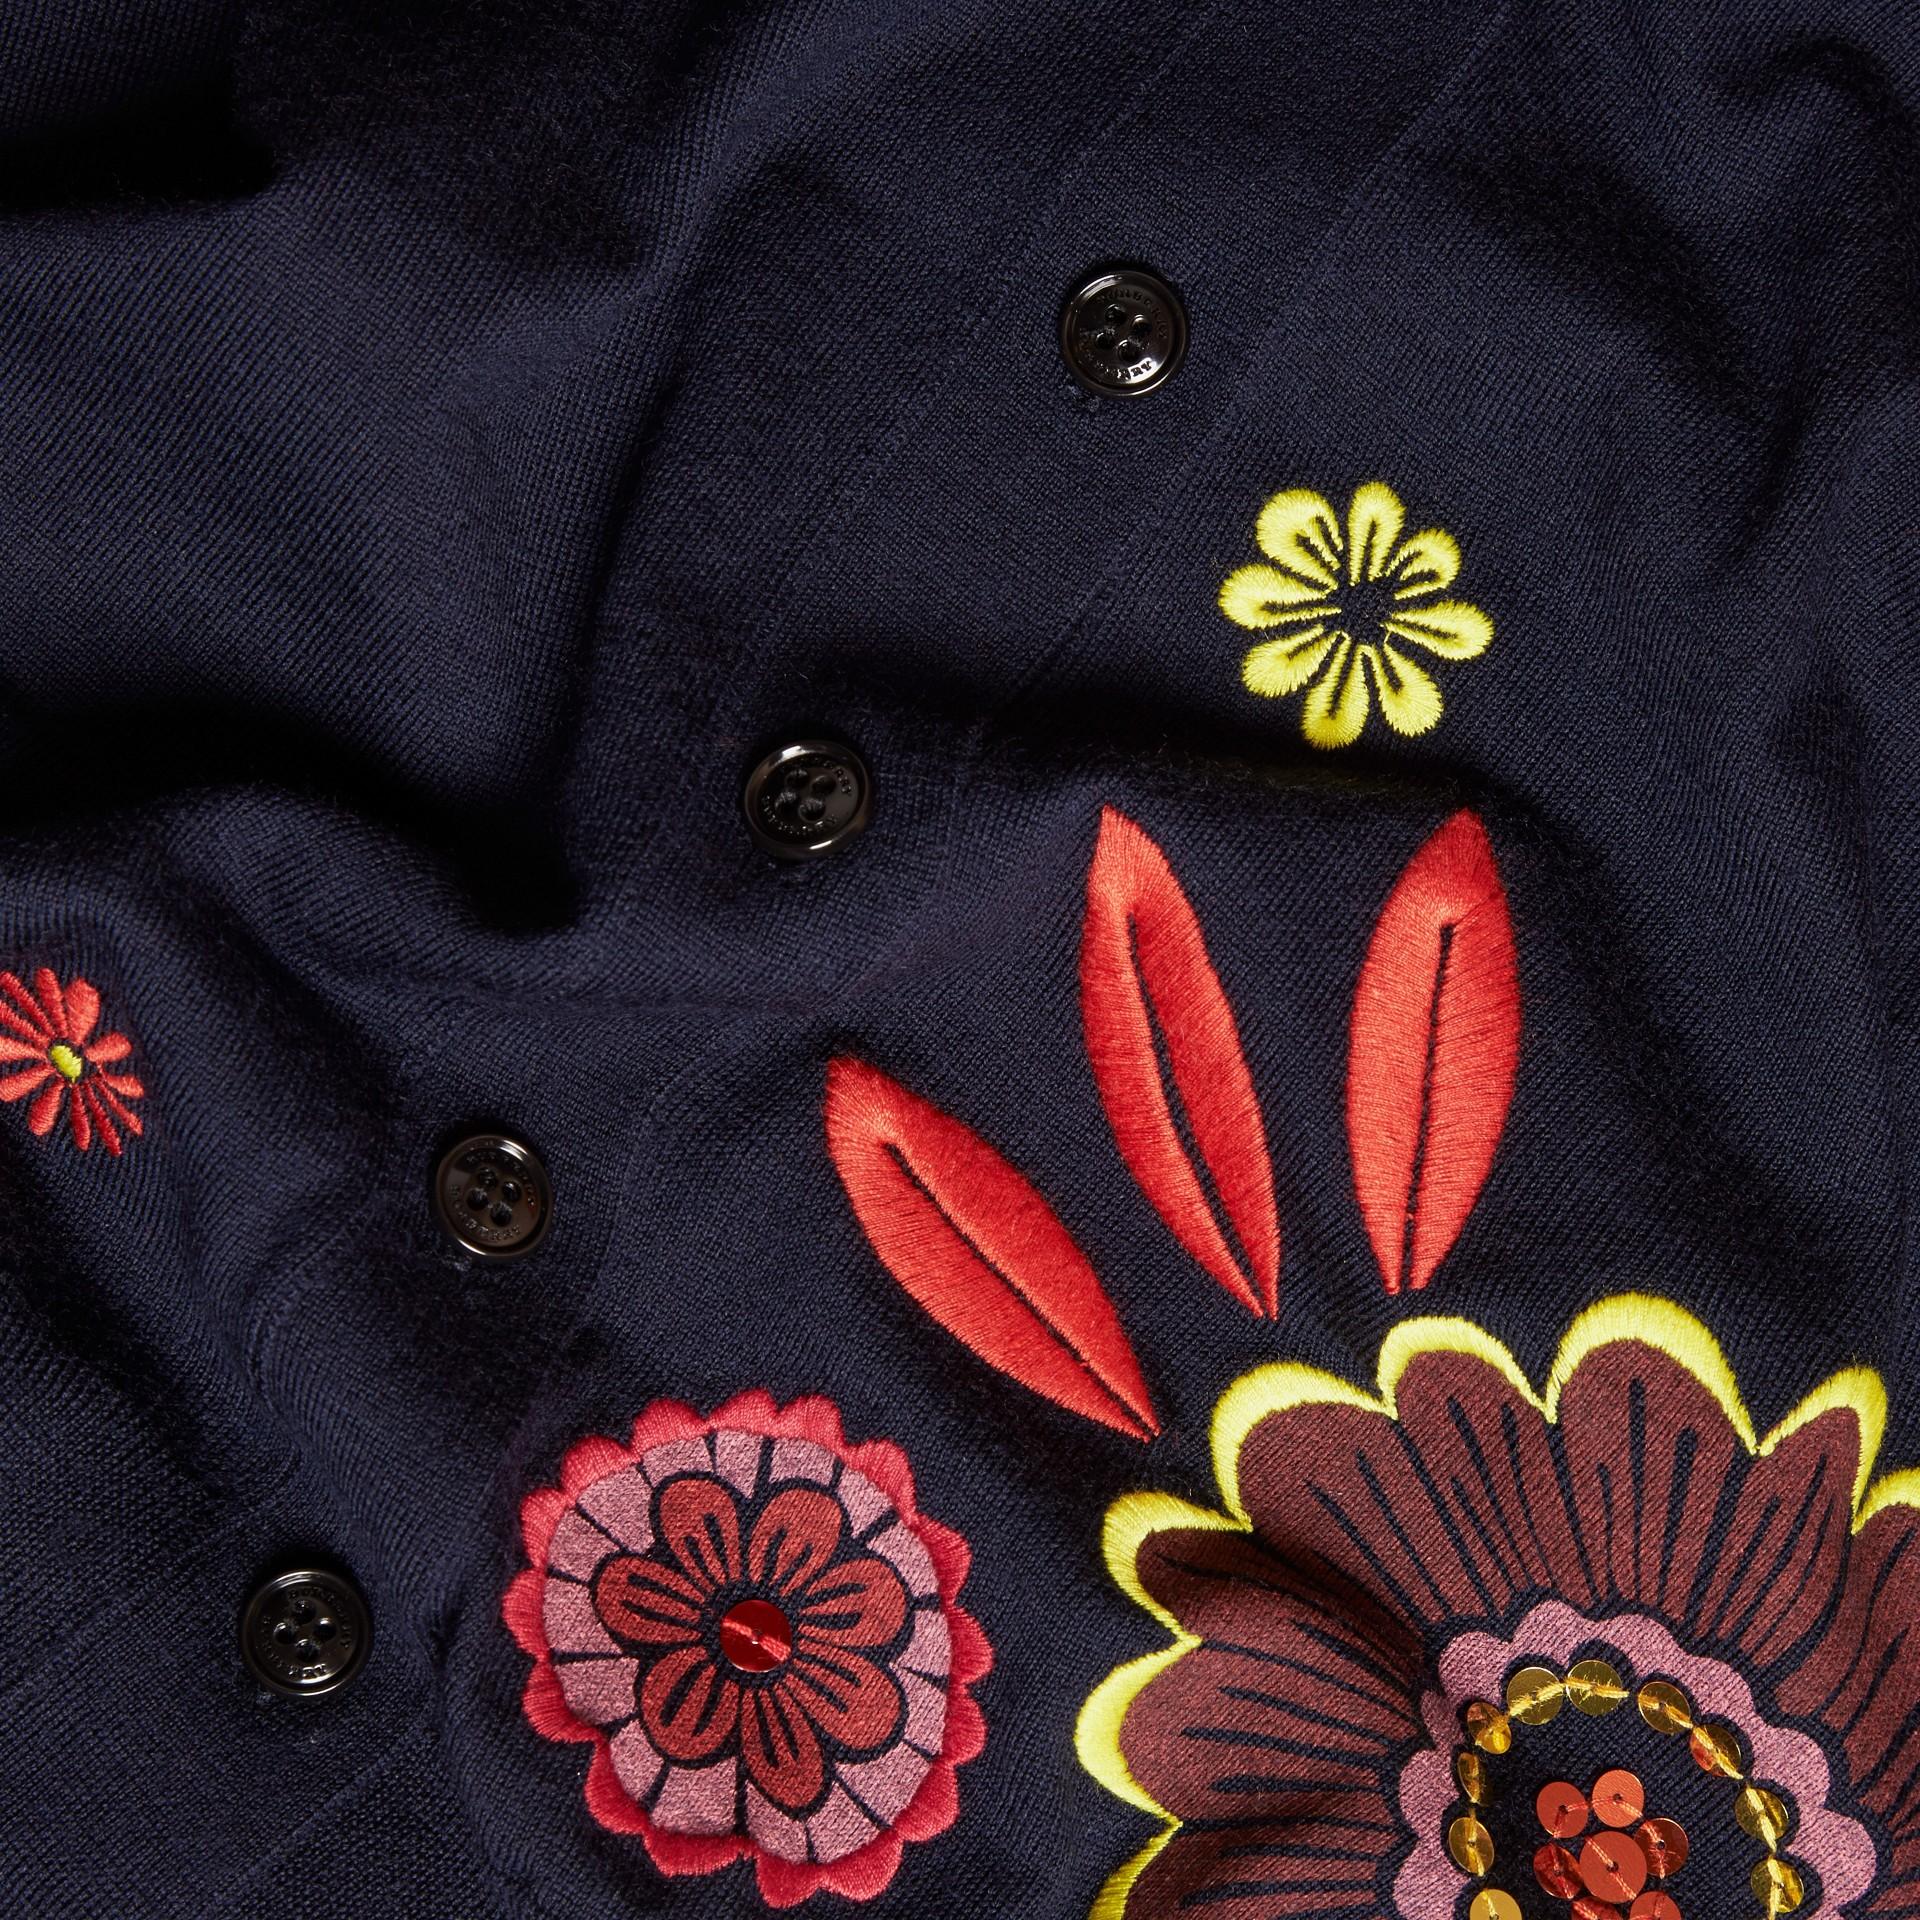 Navy Floral-embellished Merino Wool Cardigan - gallery image 2